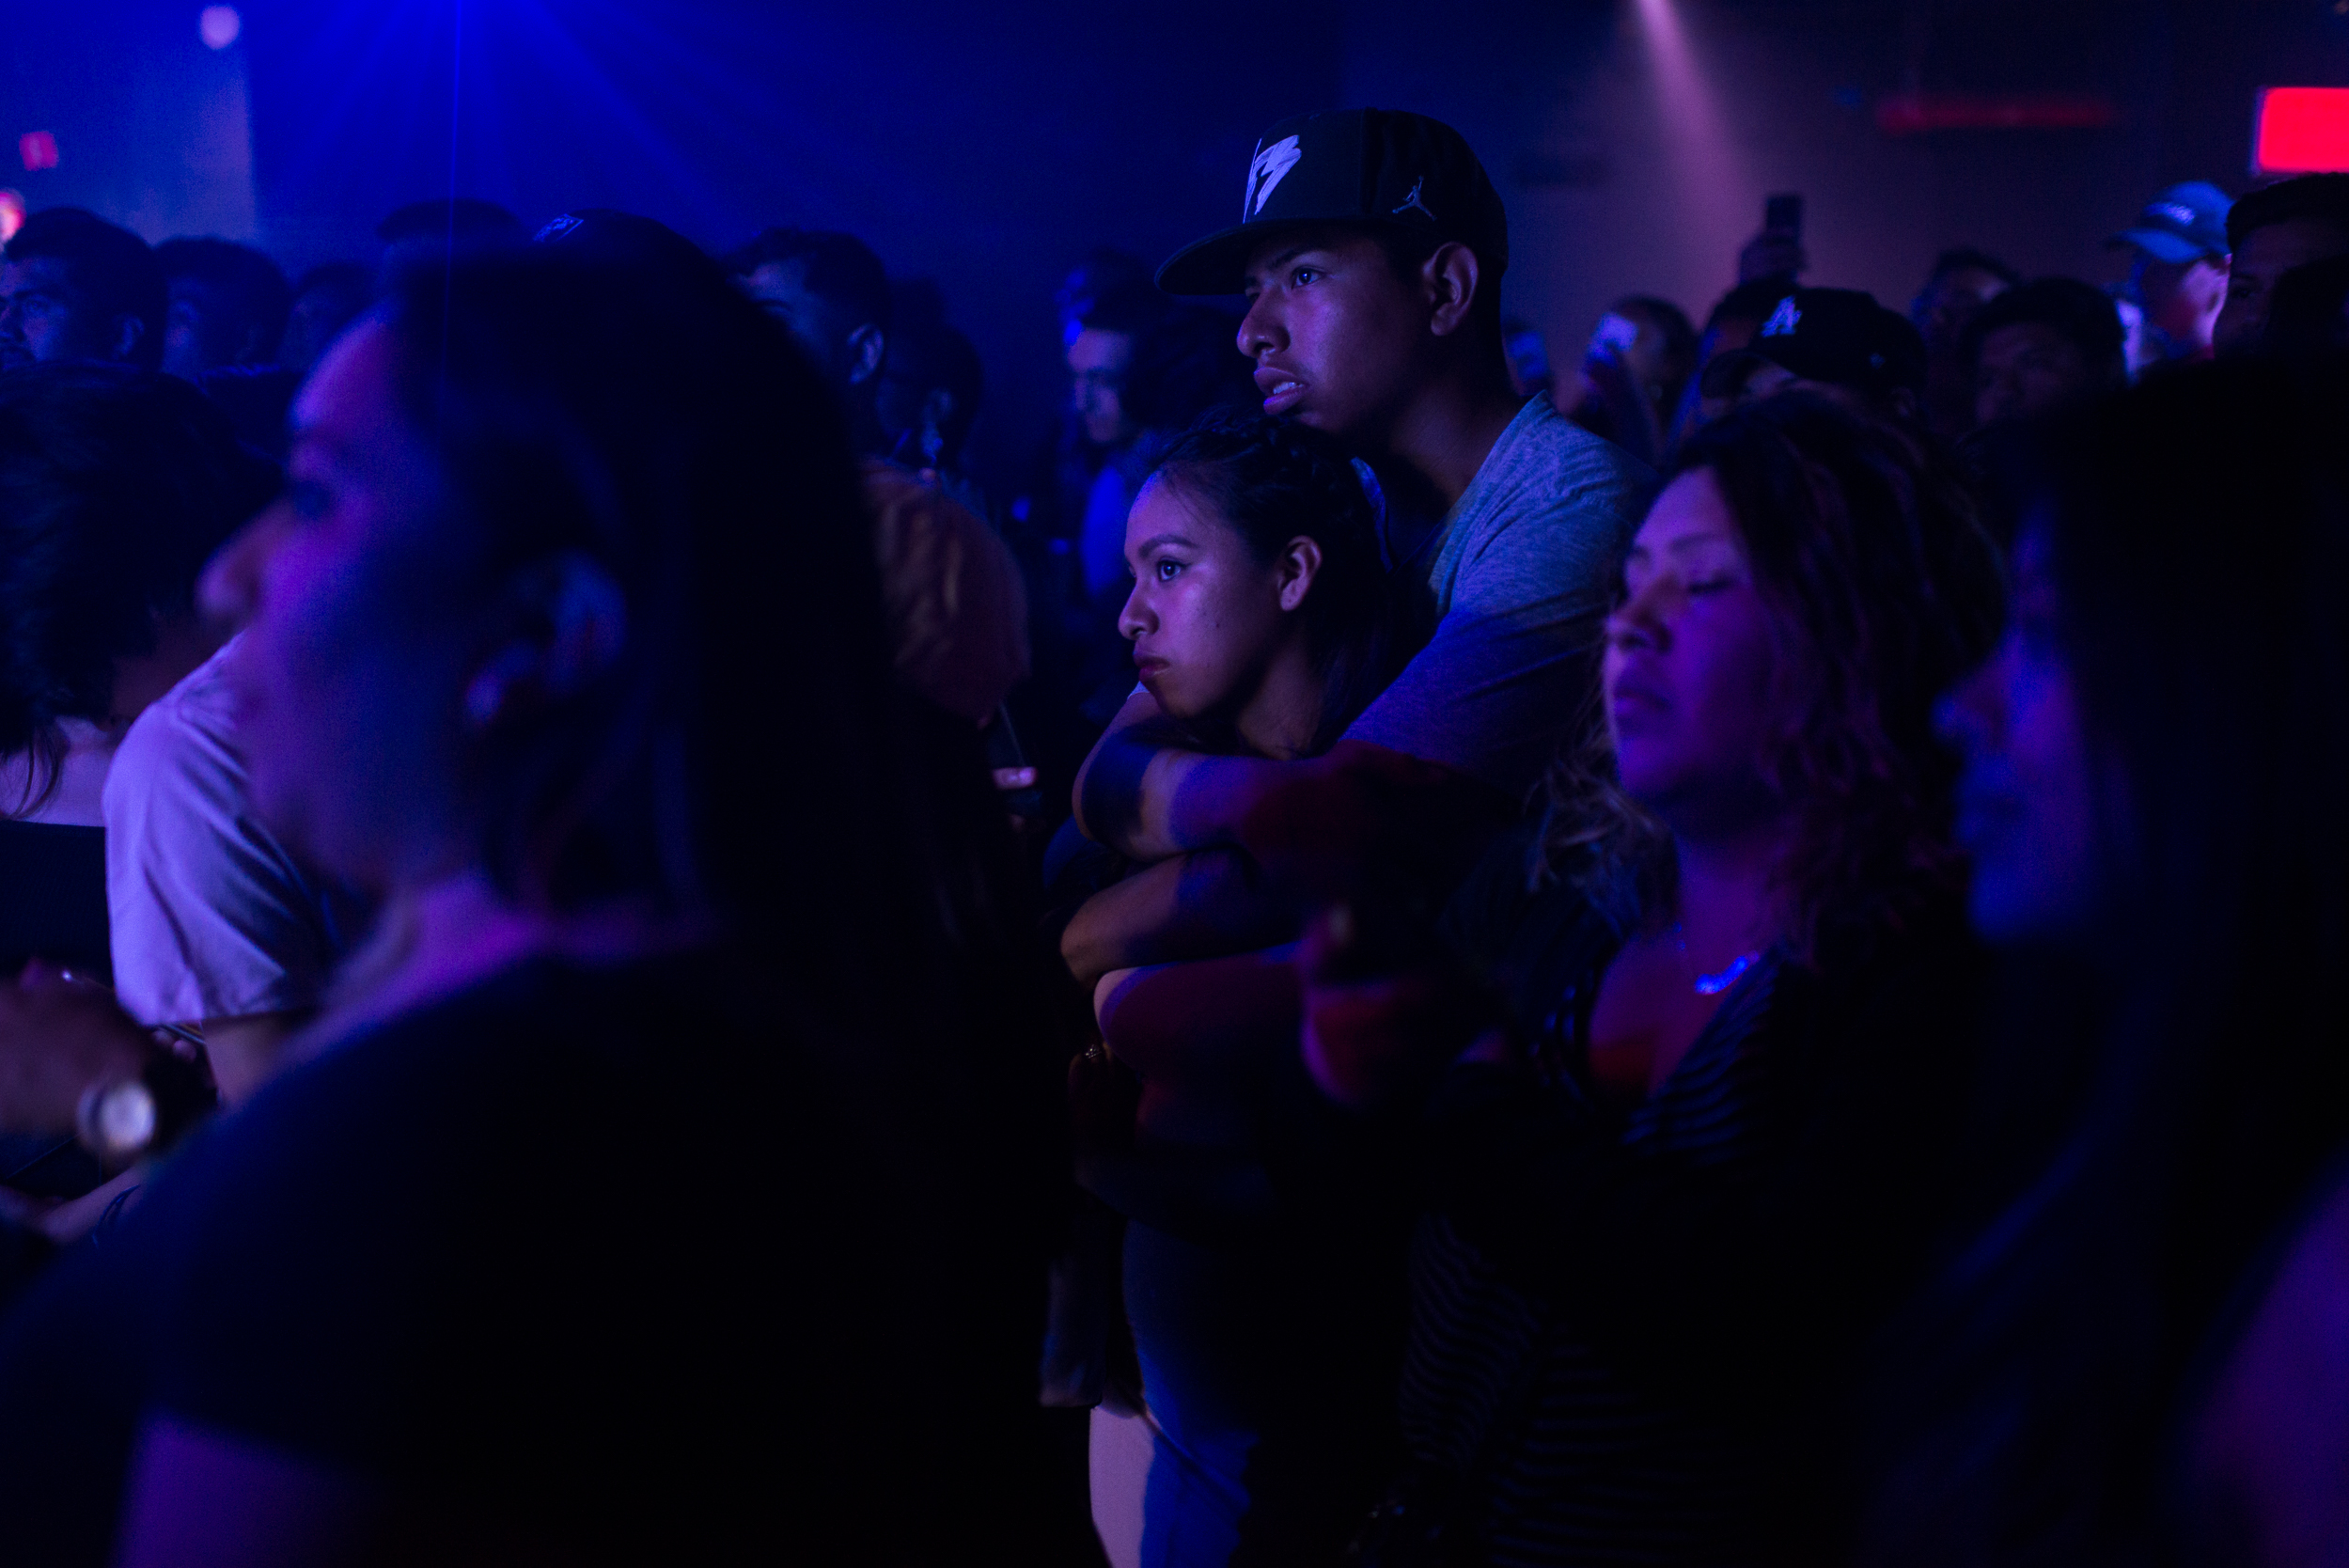 Kap-G - Audience